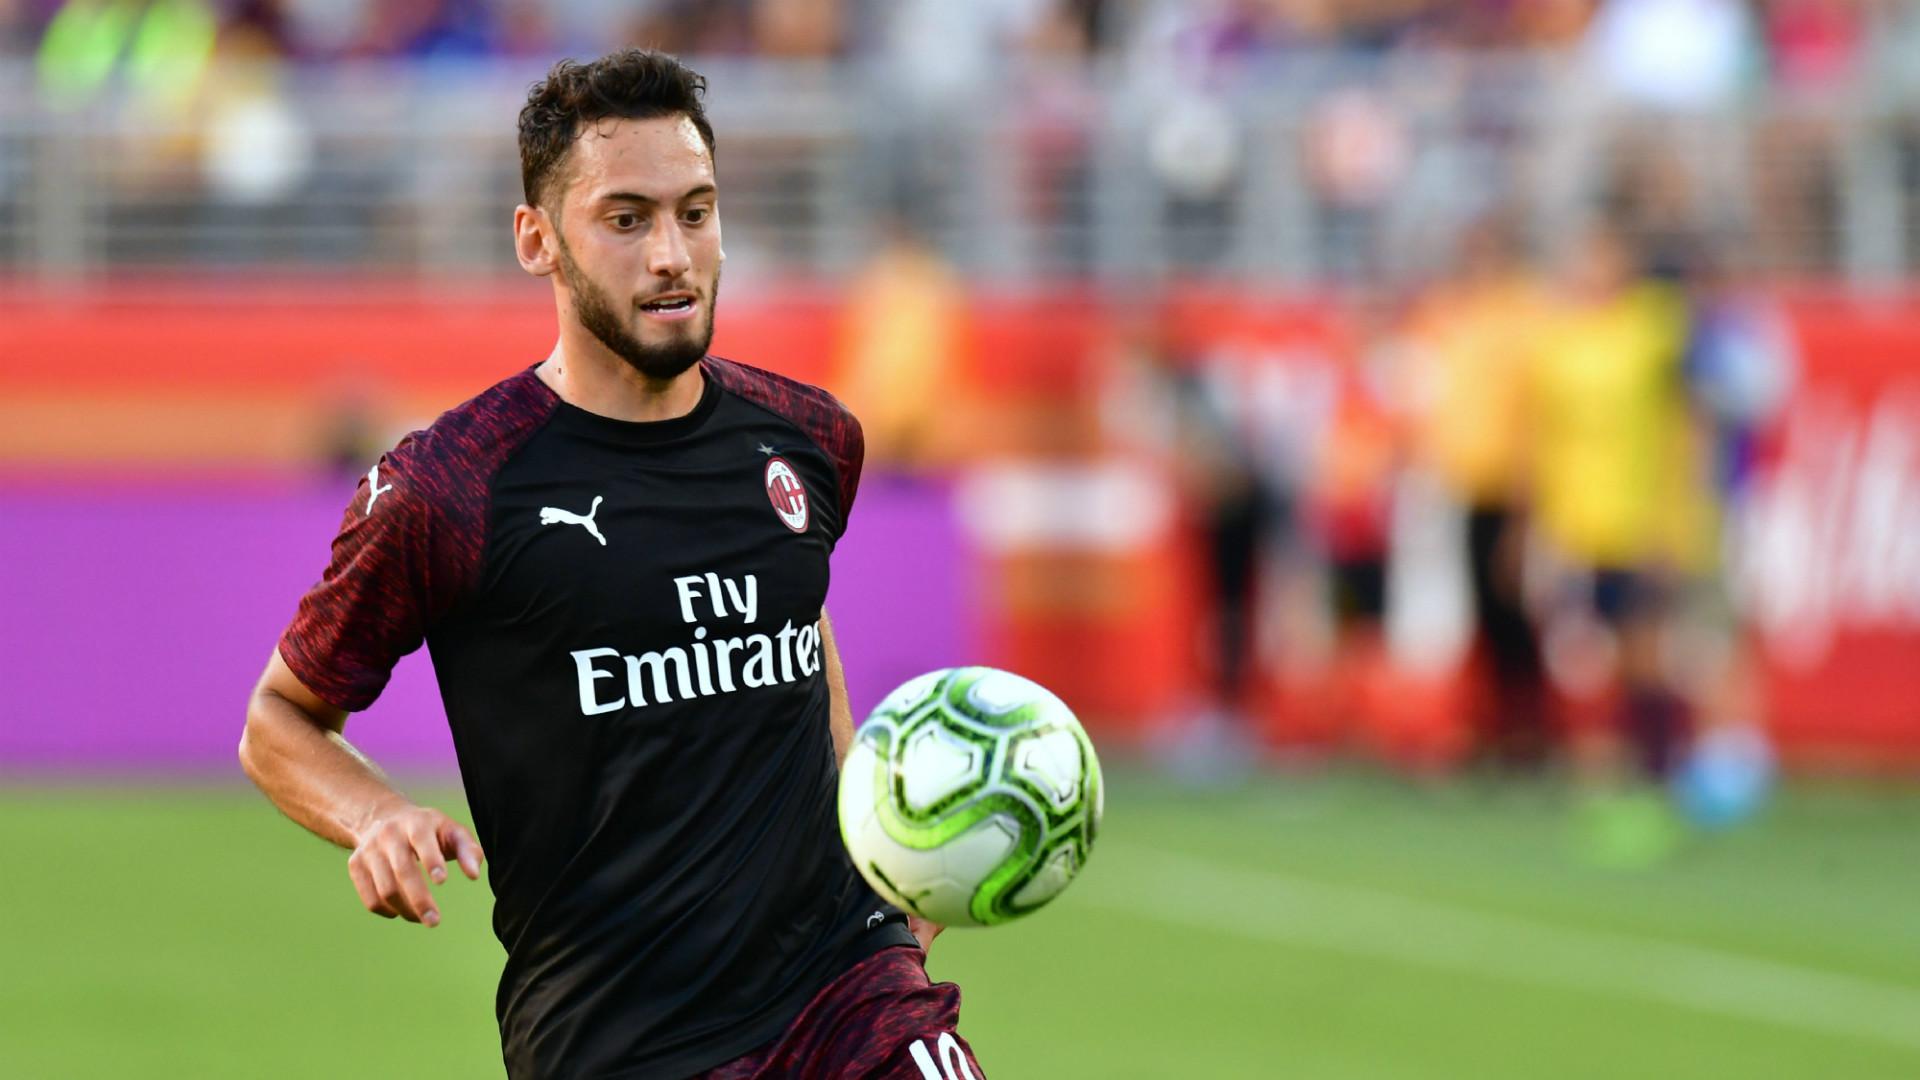 Milan-Roma 2-1, decide Cutrone al fotofinish: primi tre punti per i rossoneri